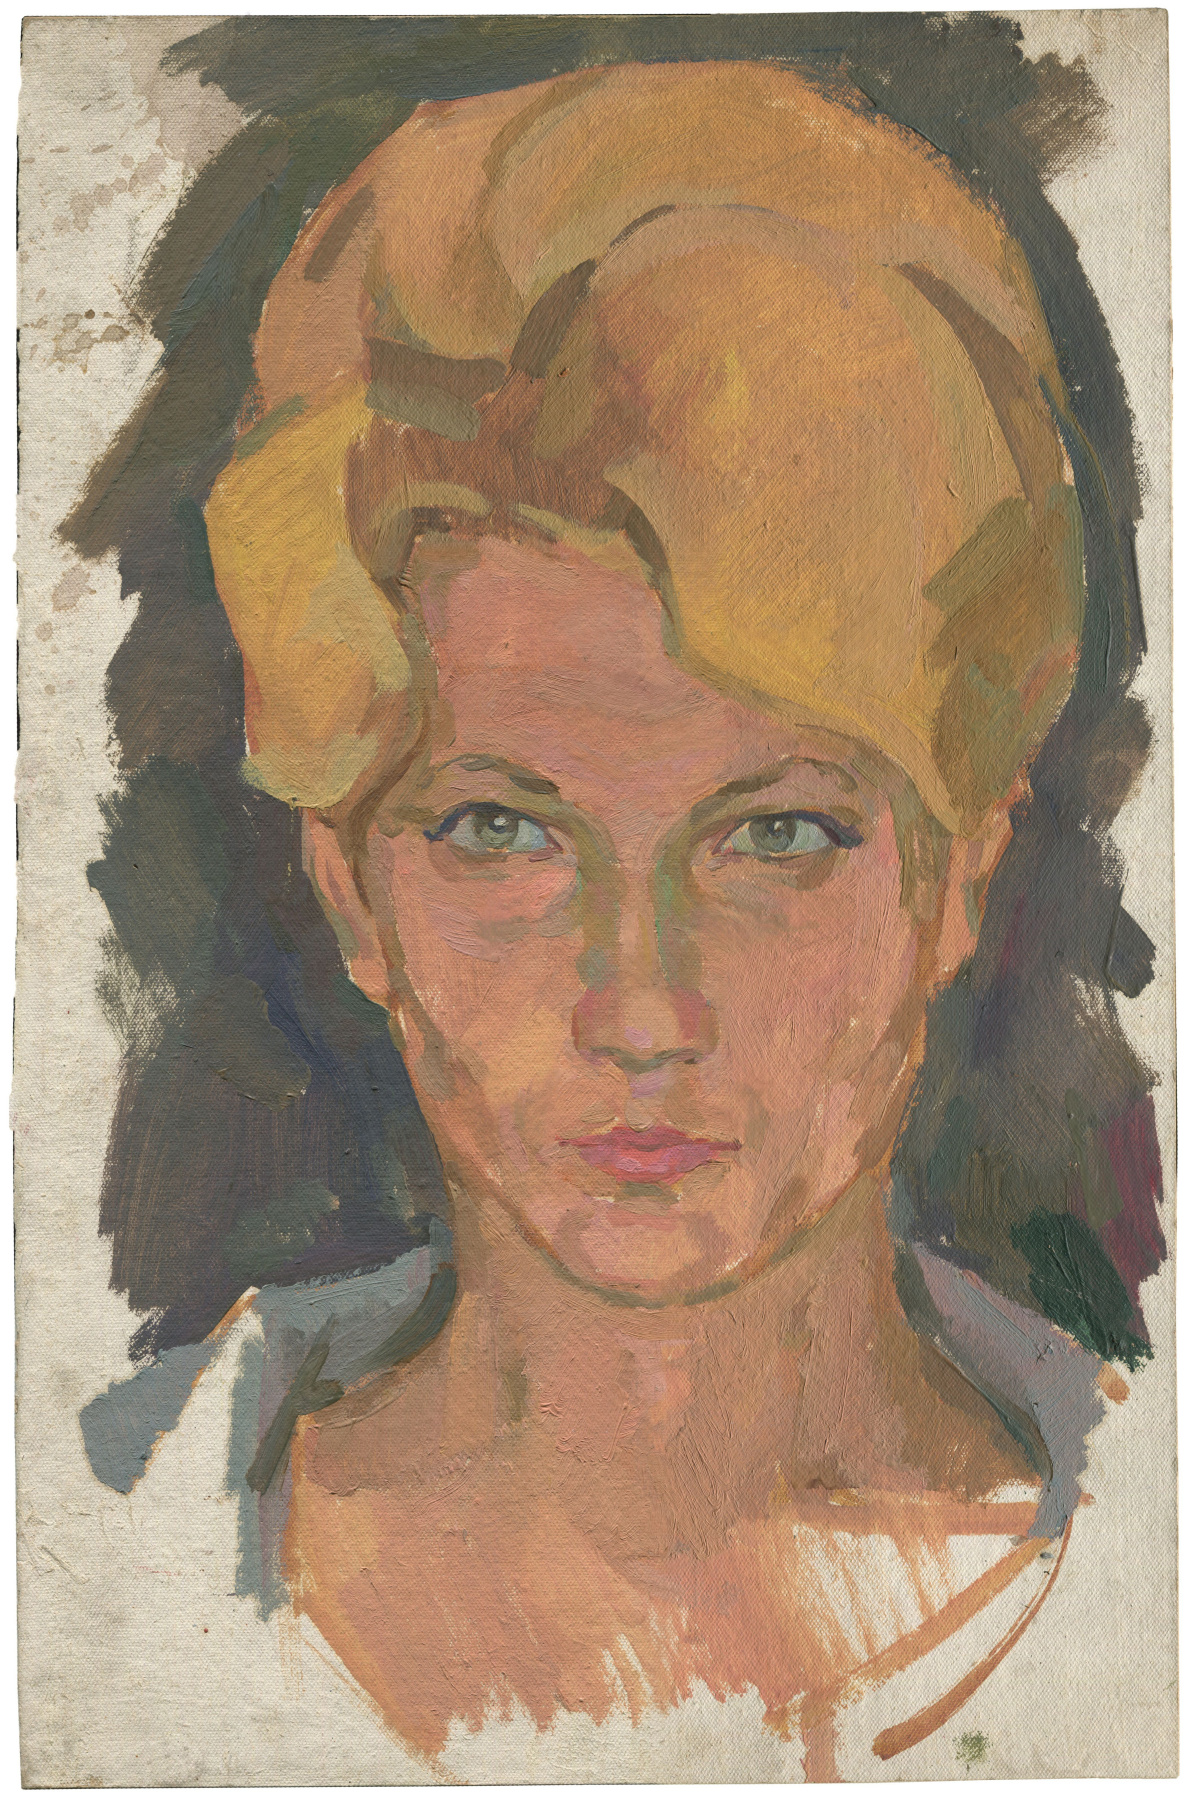 Alexandrovich Rudolf Pavlov. Portrait of a woman with blond hair.